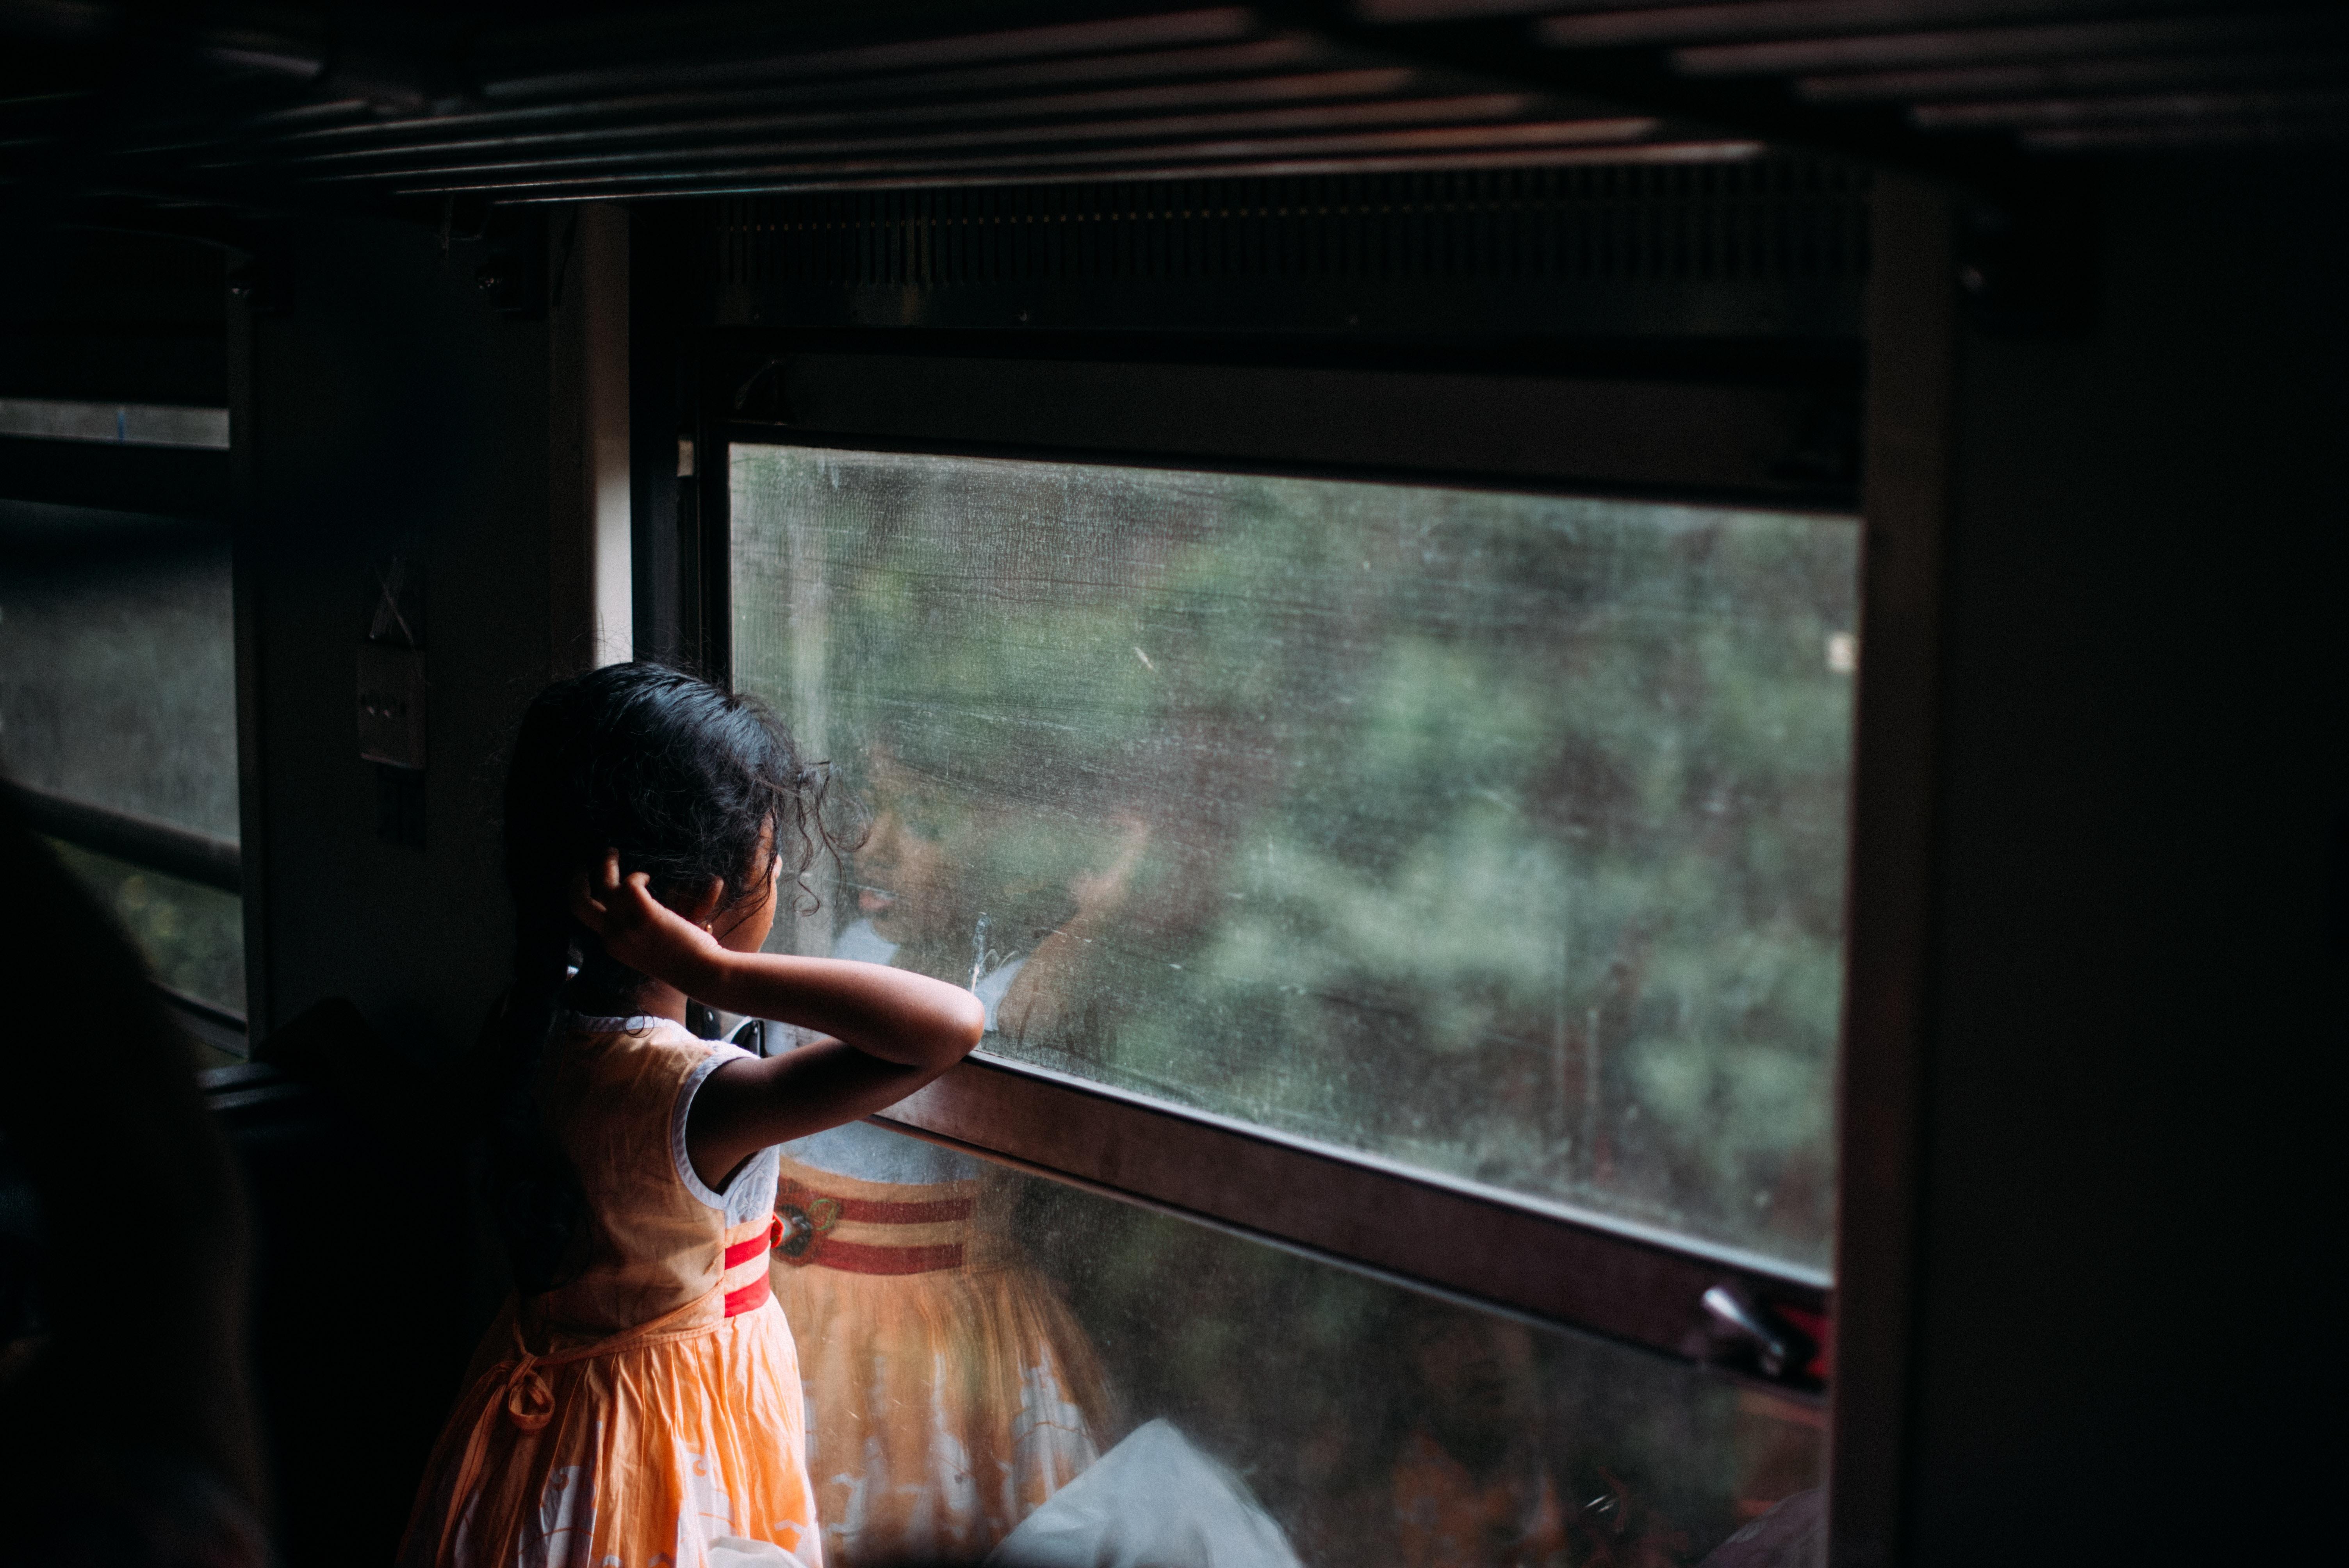 girl in orange sleeveless dress looking at the window